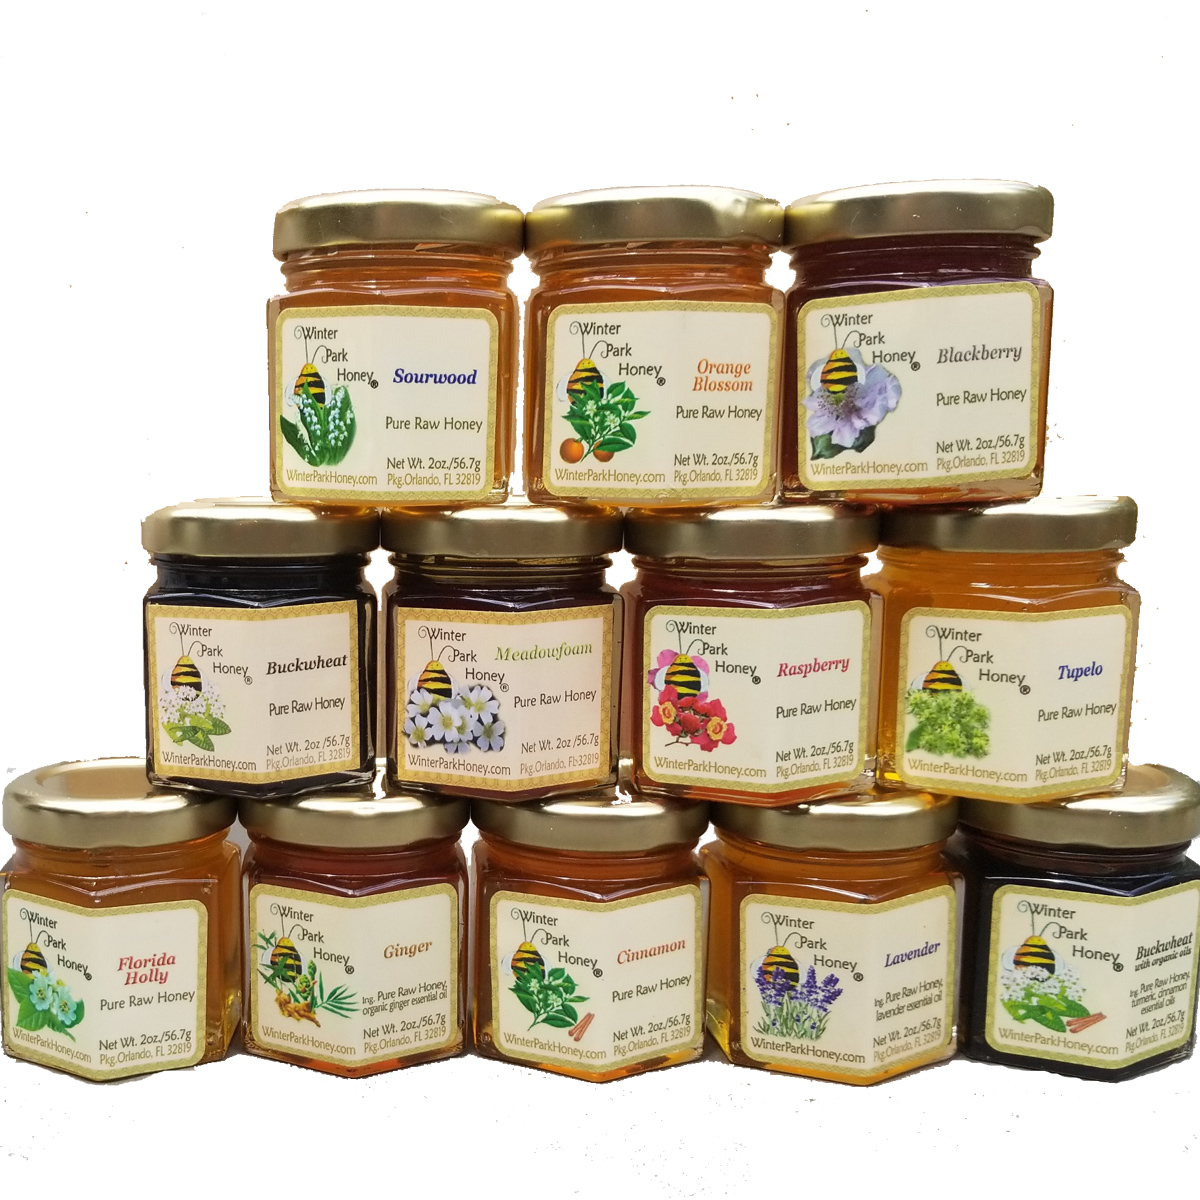 Stack of 12 glass jars of Winter park Honey